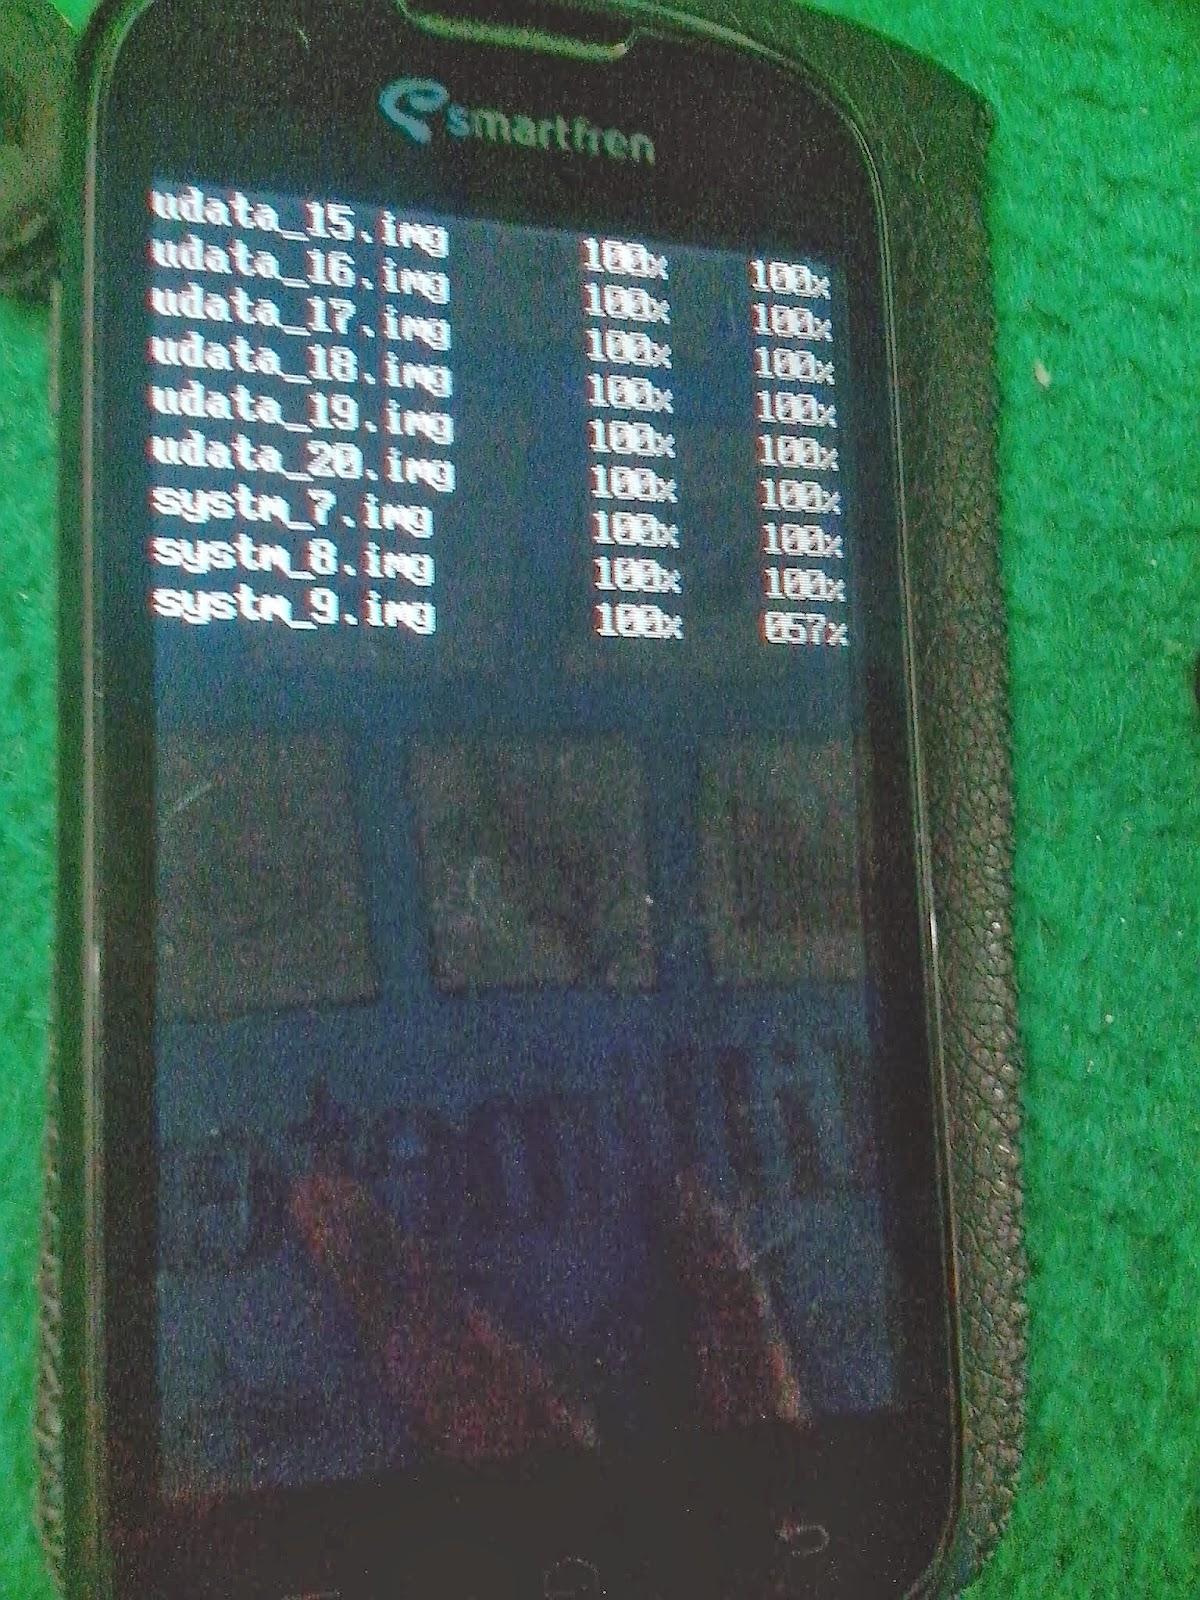 Jual Murah Smartfren Andromax C Android Ics 40 Terbaru 2018 Dell Inspiron 15 7567 I5 7300hq 4gb Gtx 1050 Ti 156ampquot Fhd Red Solusi Bootloop Brick Lupa Pattern Pola Tidak Bisa Masuk Recovery